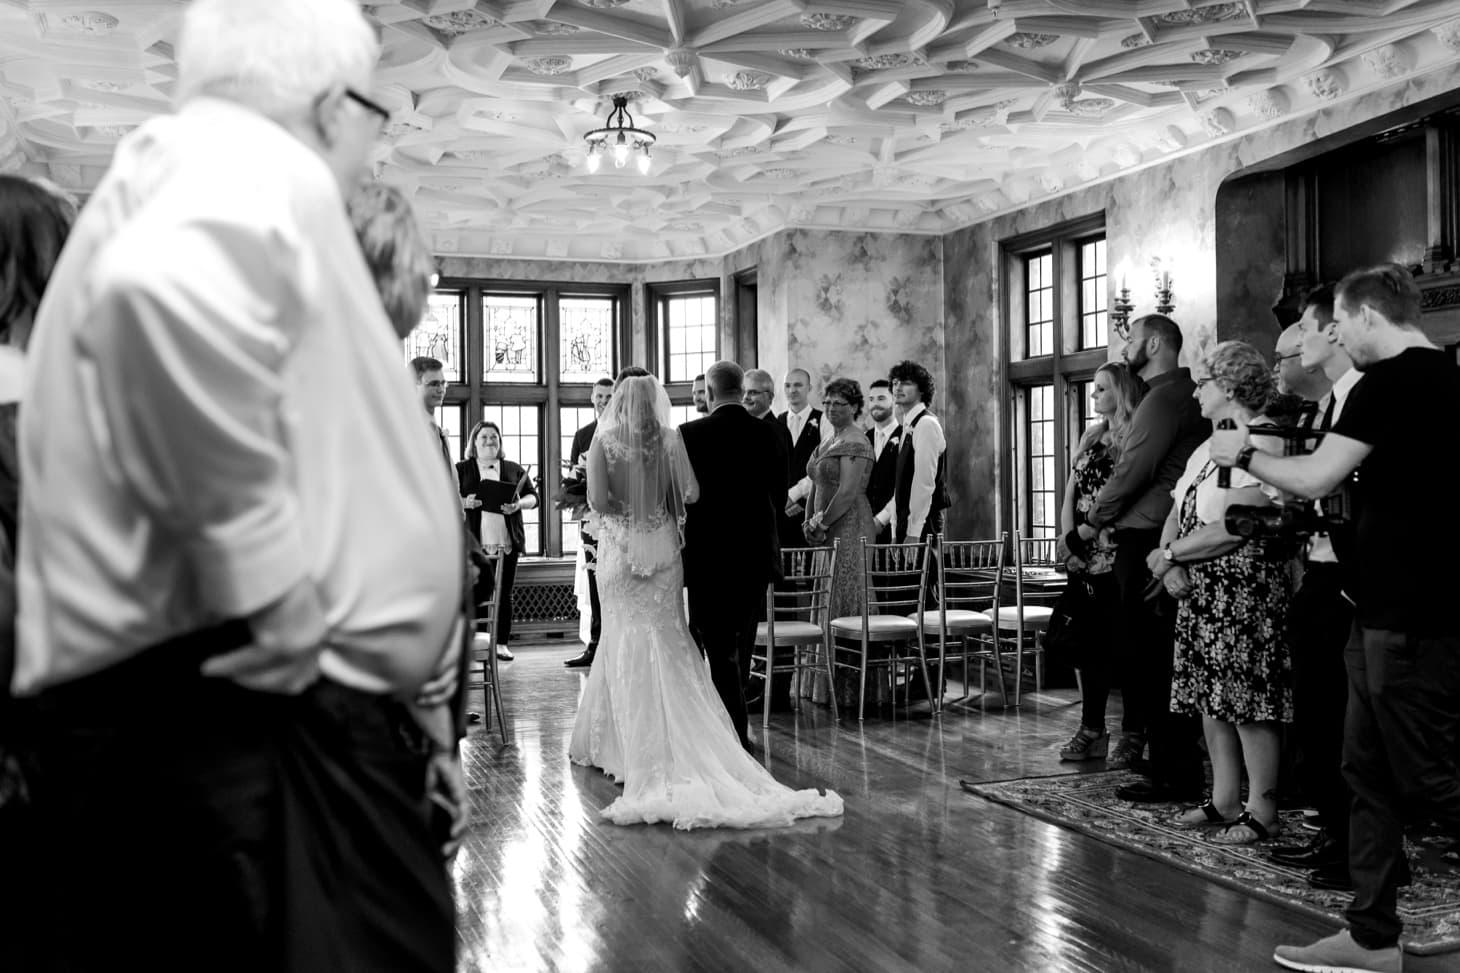 bride walking down the aisle des moines iowa wedding